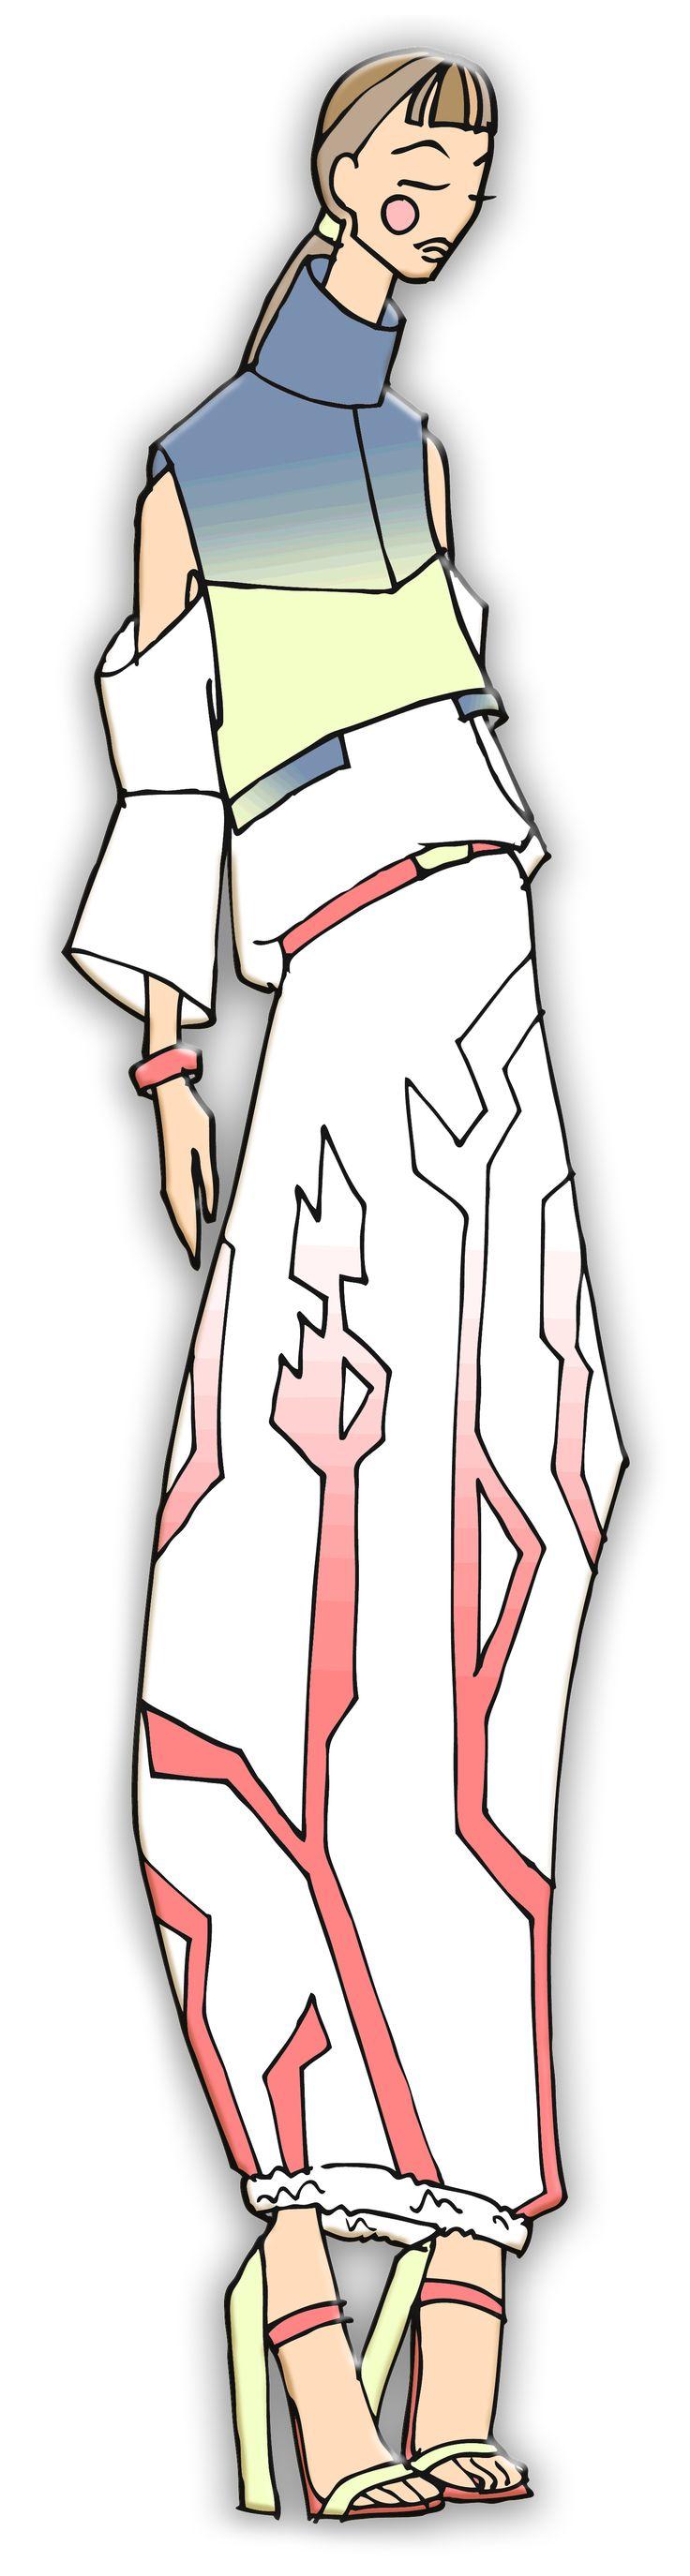 #fashionillustration #illustration #watercolor #aquarelle #sketch #sketchbook #drawing #magazine #blackandwhite #style #vogue #artist #photography #artwork #streetstyle #editorial #art #streetphotography #inspiration #model #streetfashion #artist #digitalart #creator #top #girl #music #beautiful #look #hair #woman #instafashion #fashionblogger #mensfashion #fashionable #fashionblog #womensfashion #fashionweek #fashionphotography #highfashion #kidsfashion #fashionshow #fashiondaily #comics…